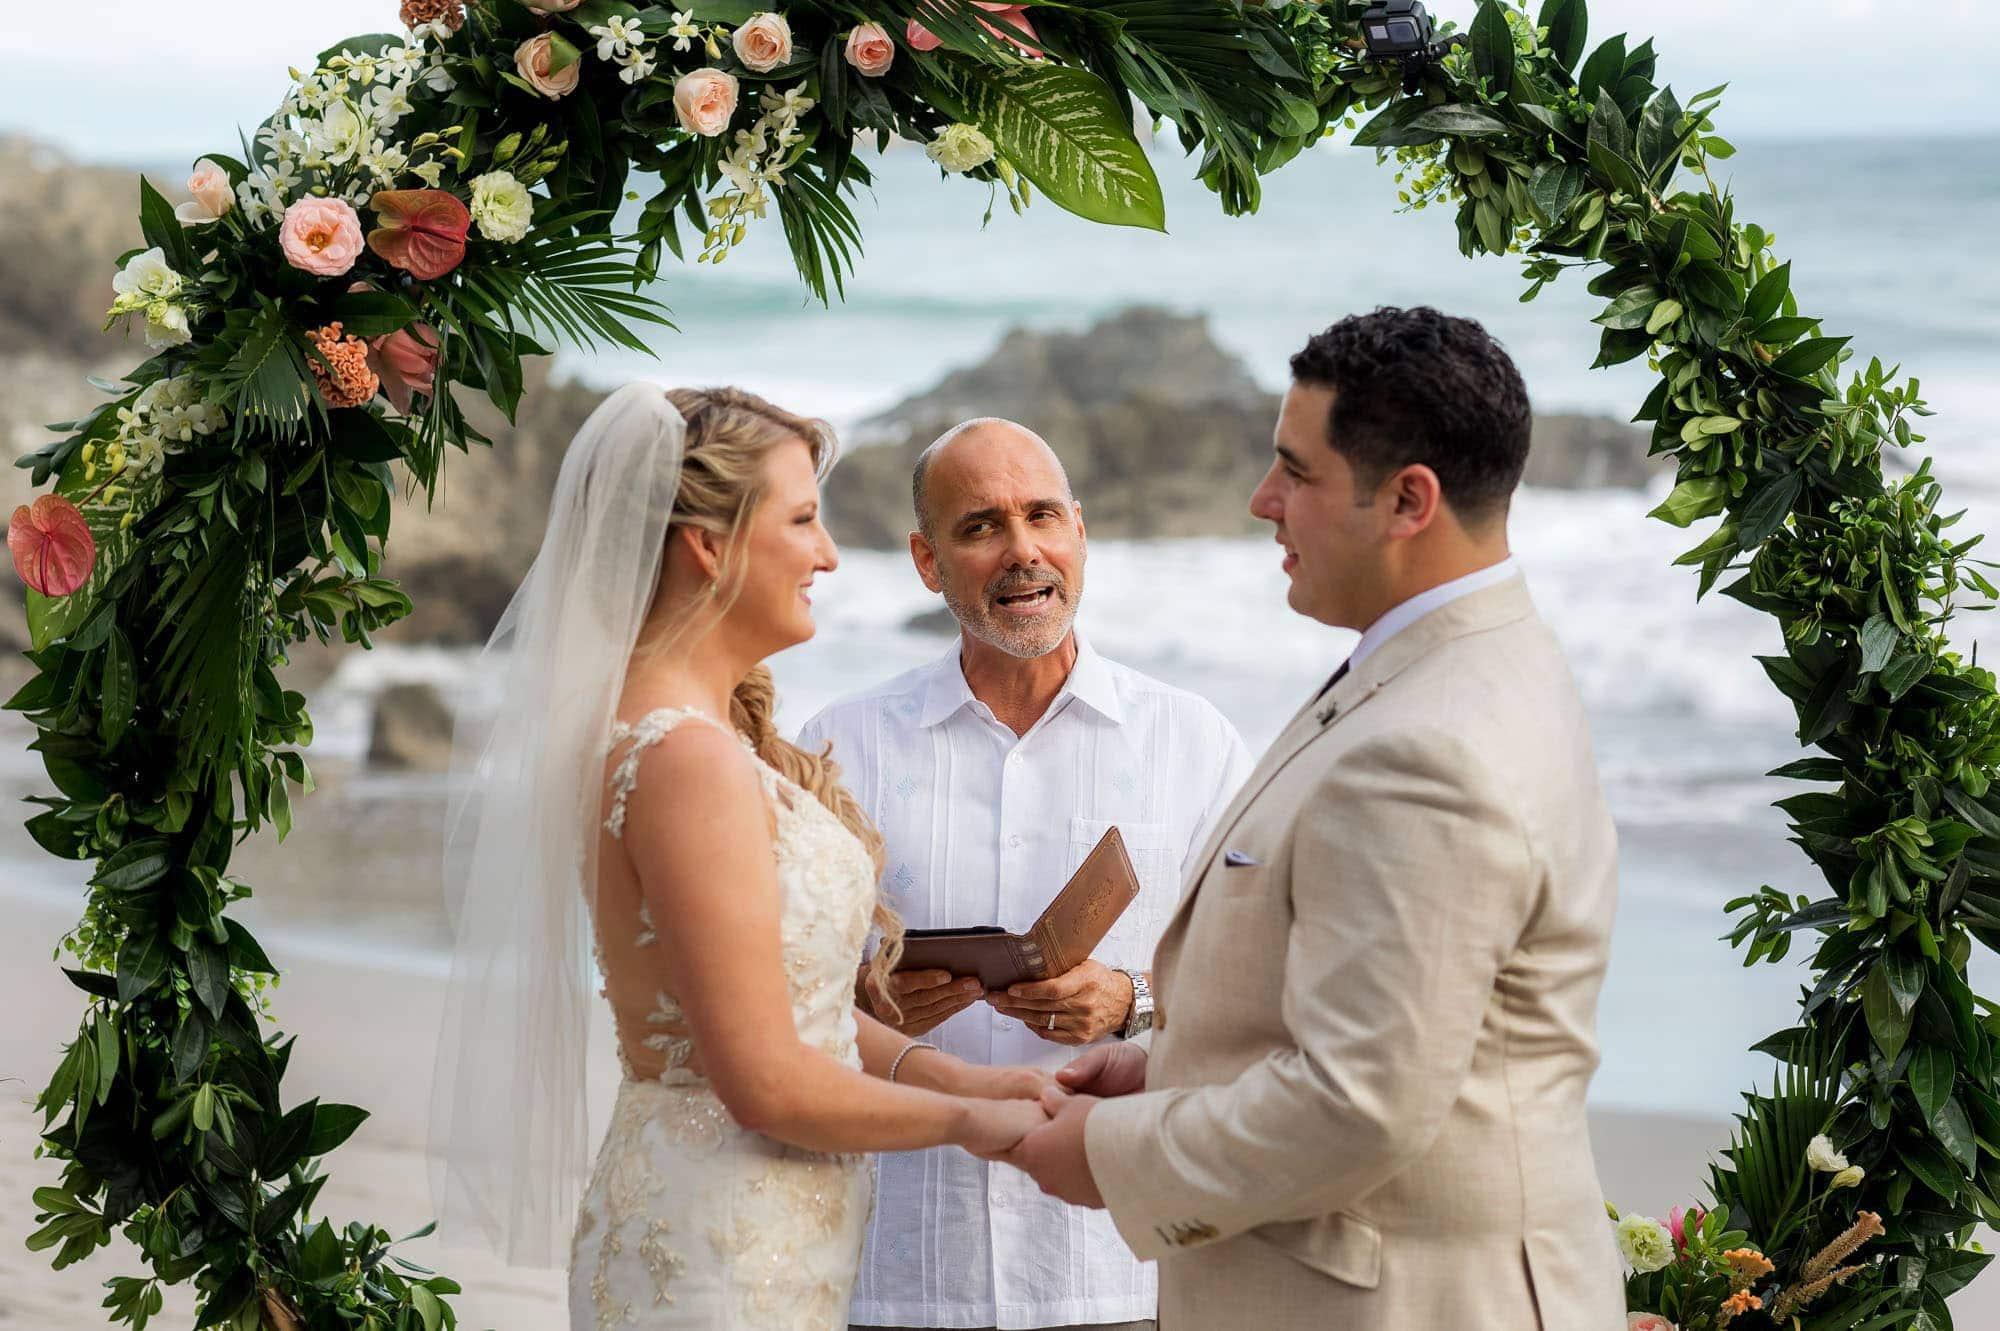 Ceremony shot